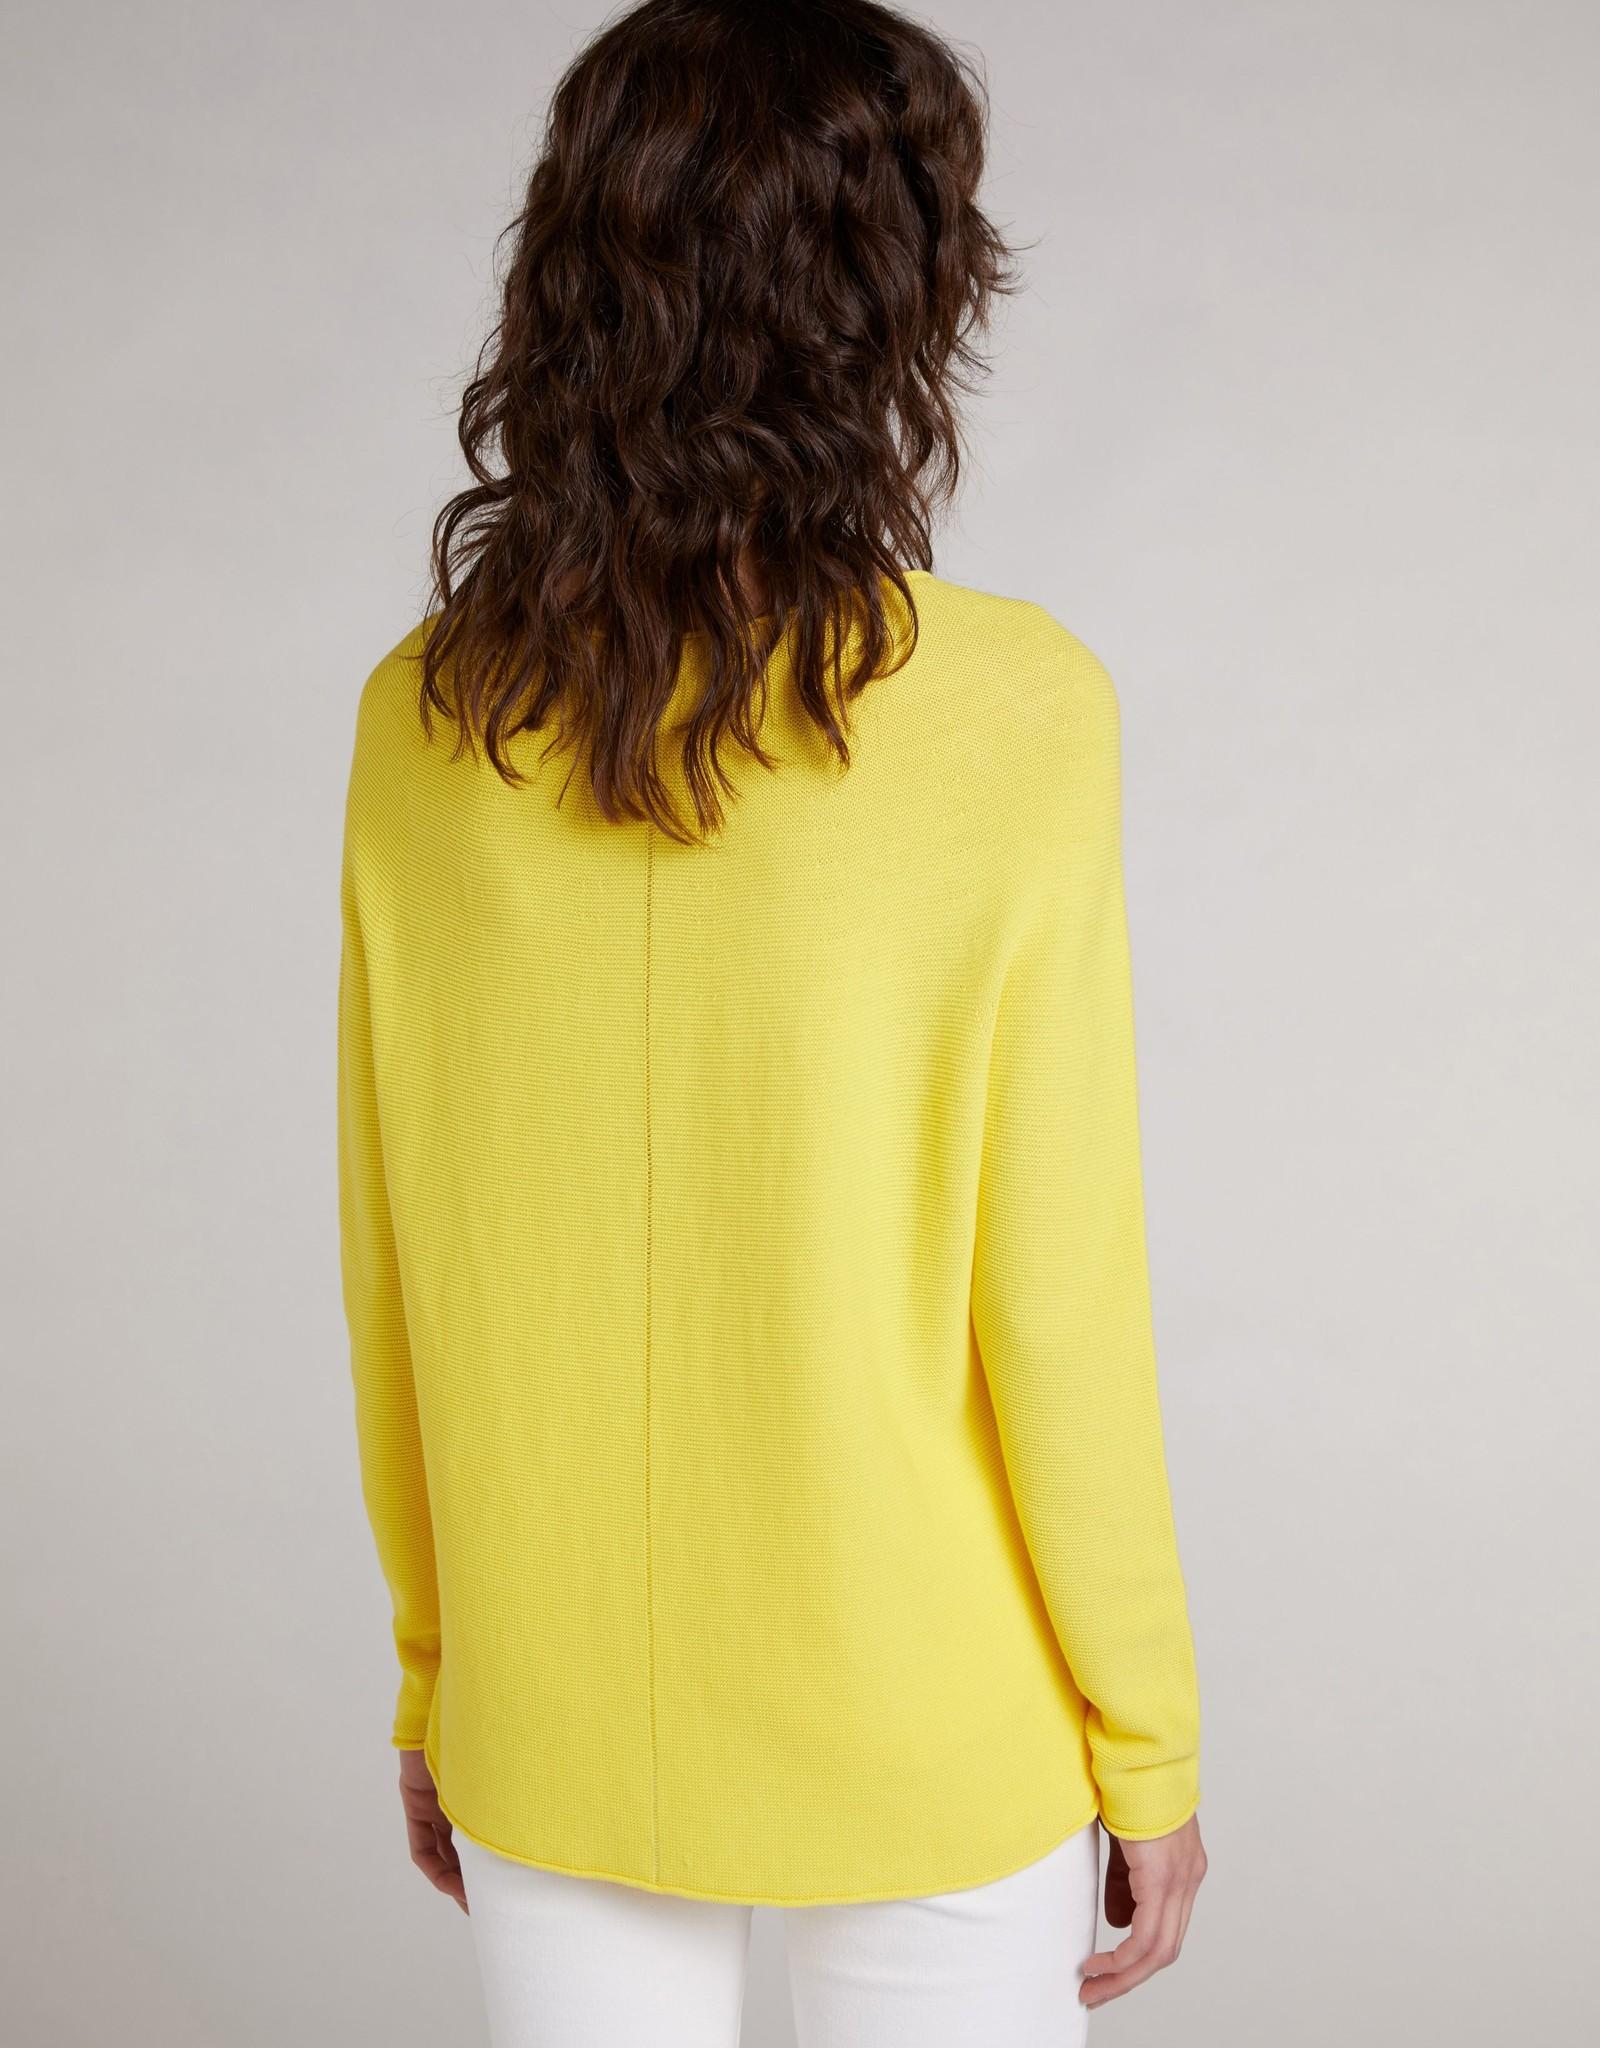 Oui Basis Pullover Geel